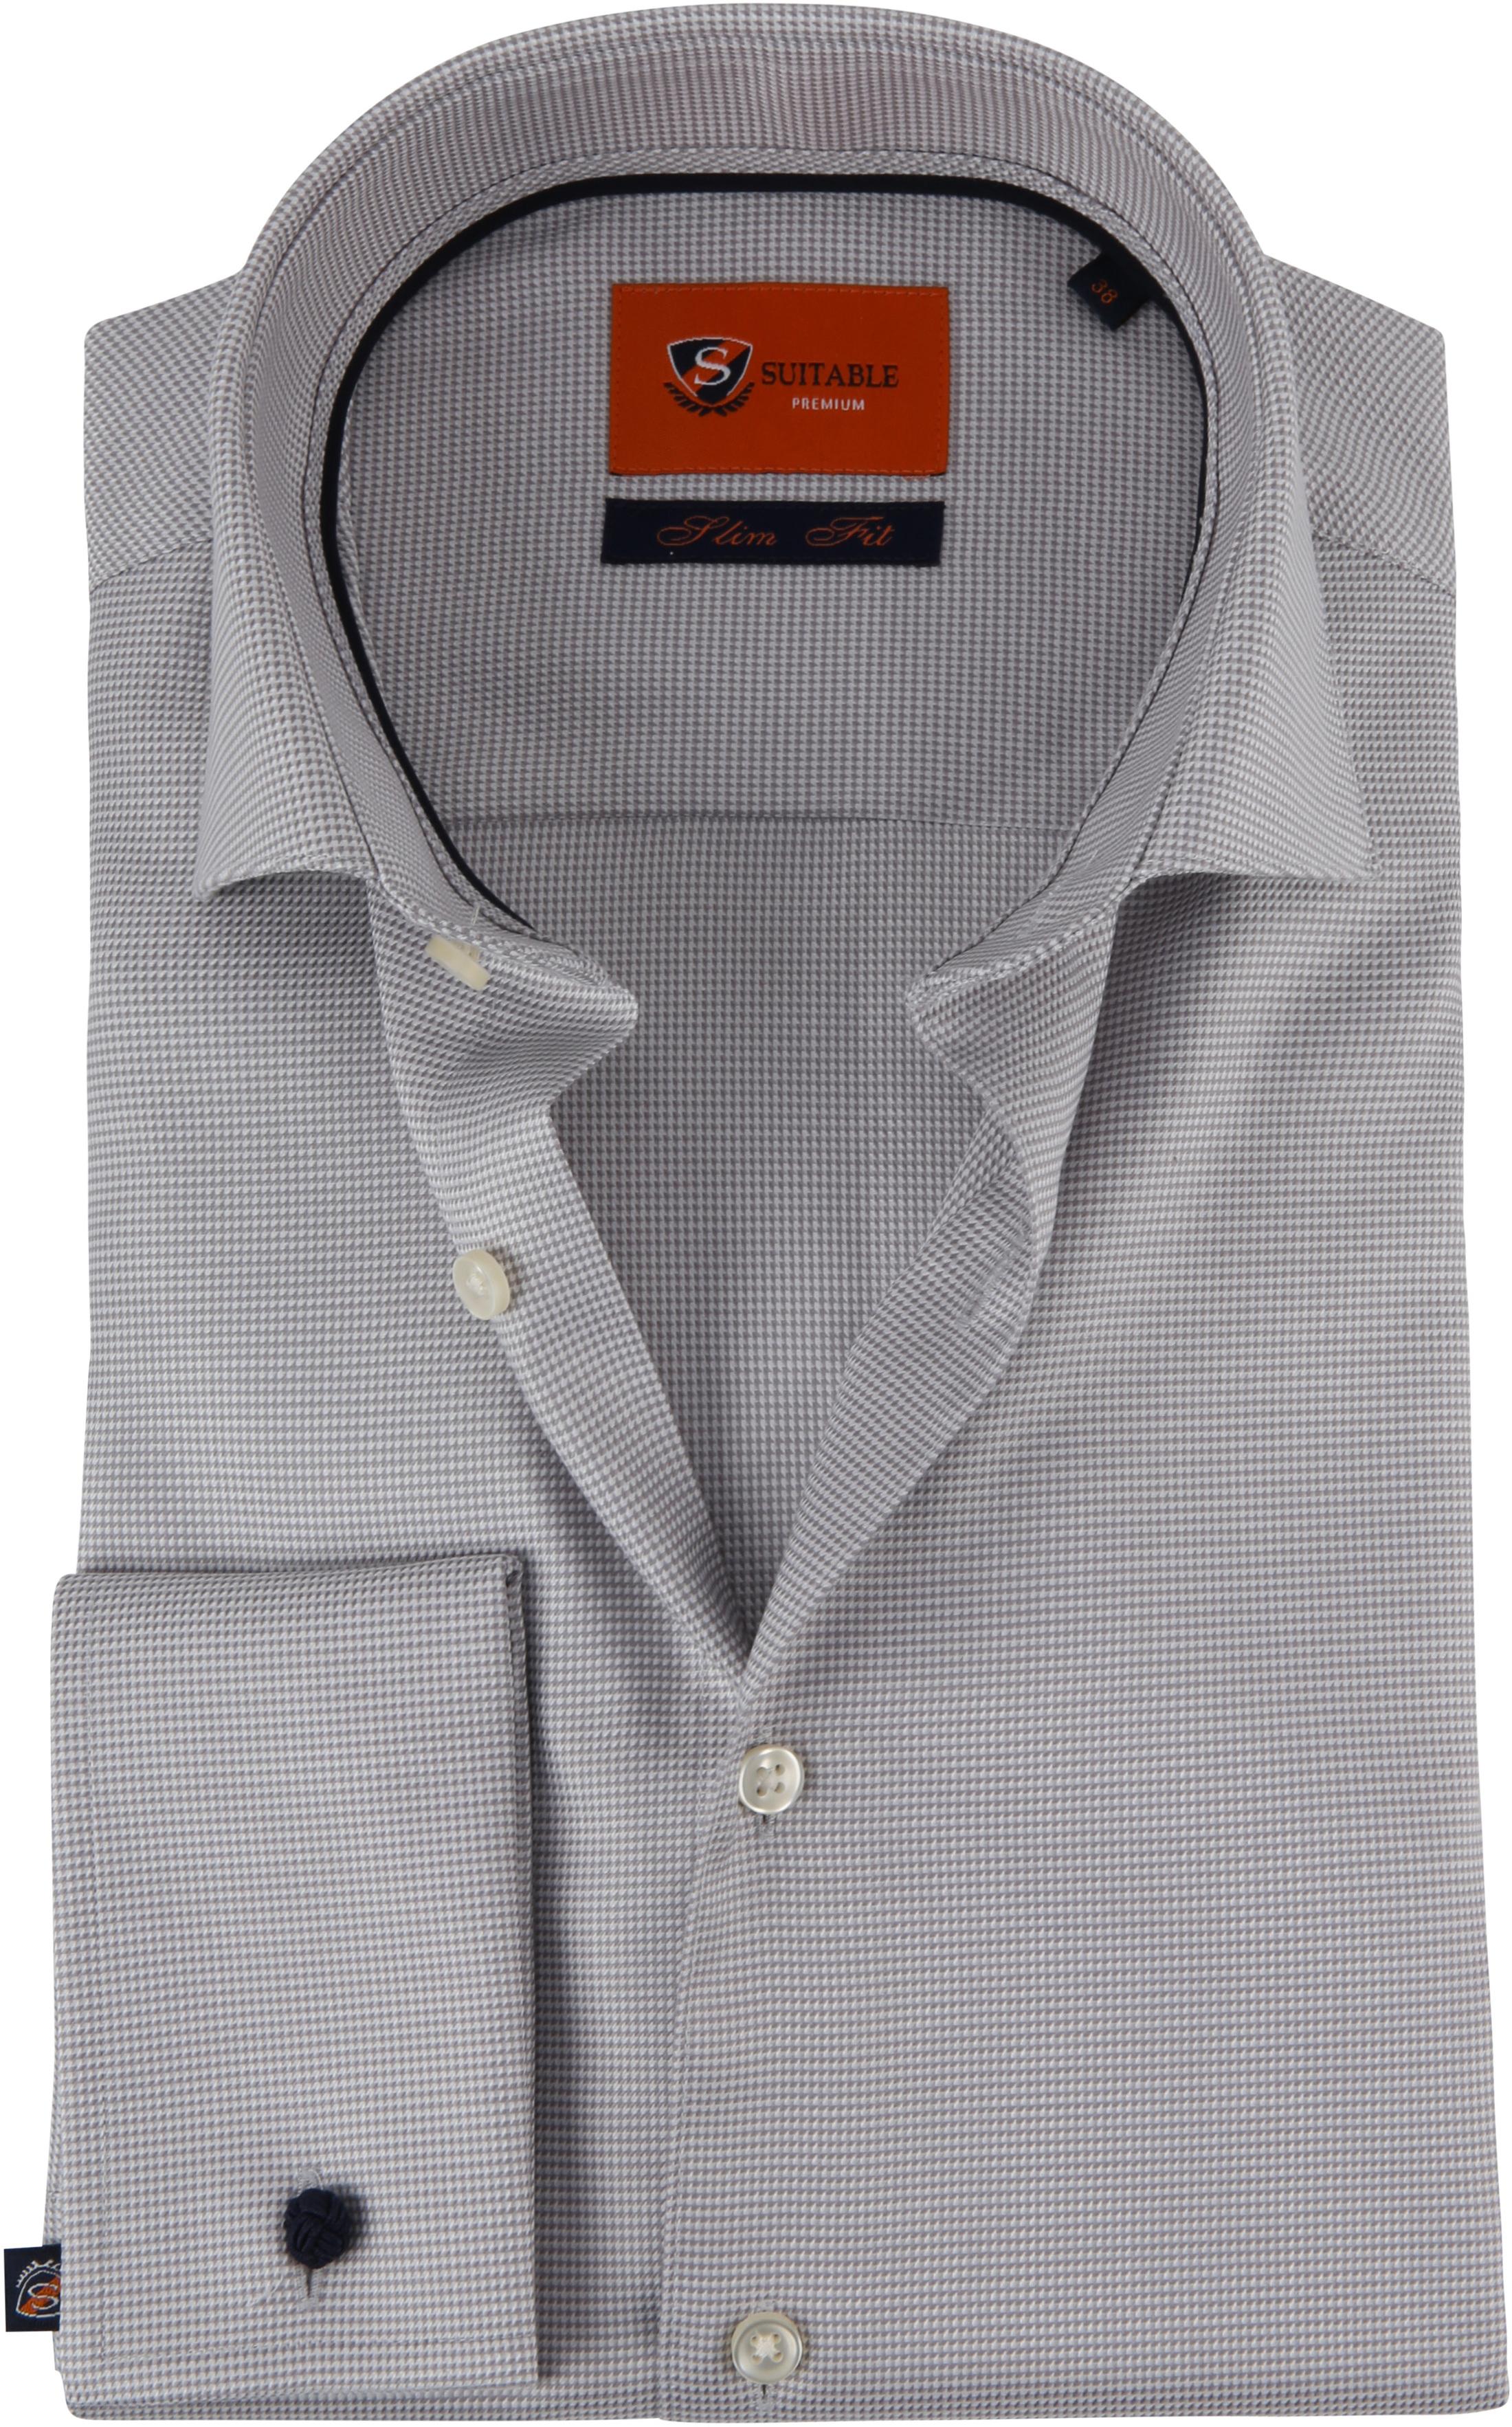 De Sf Bestellen Suitable Overhemd D82 Online Piede Dm Grijs Poule 18 kZTXiulOPw